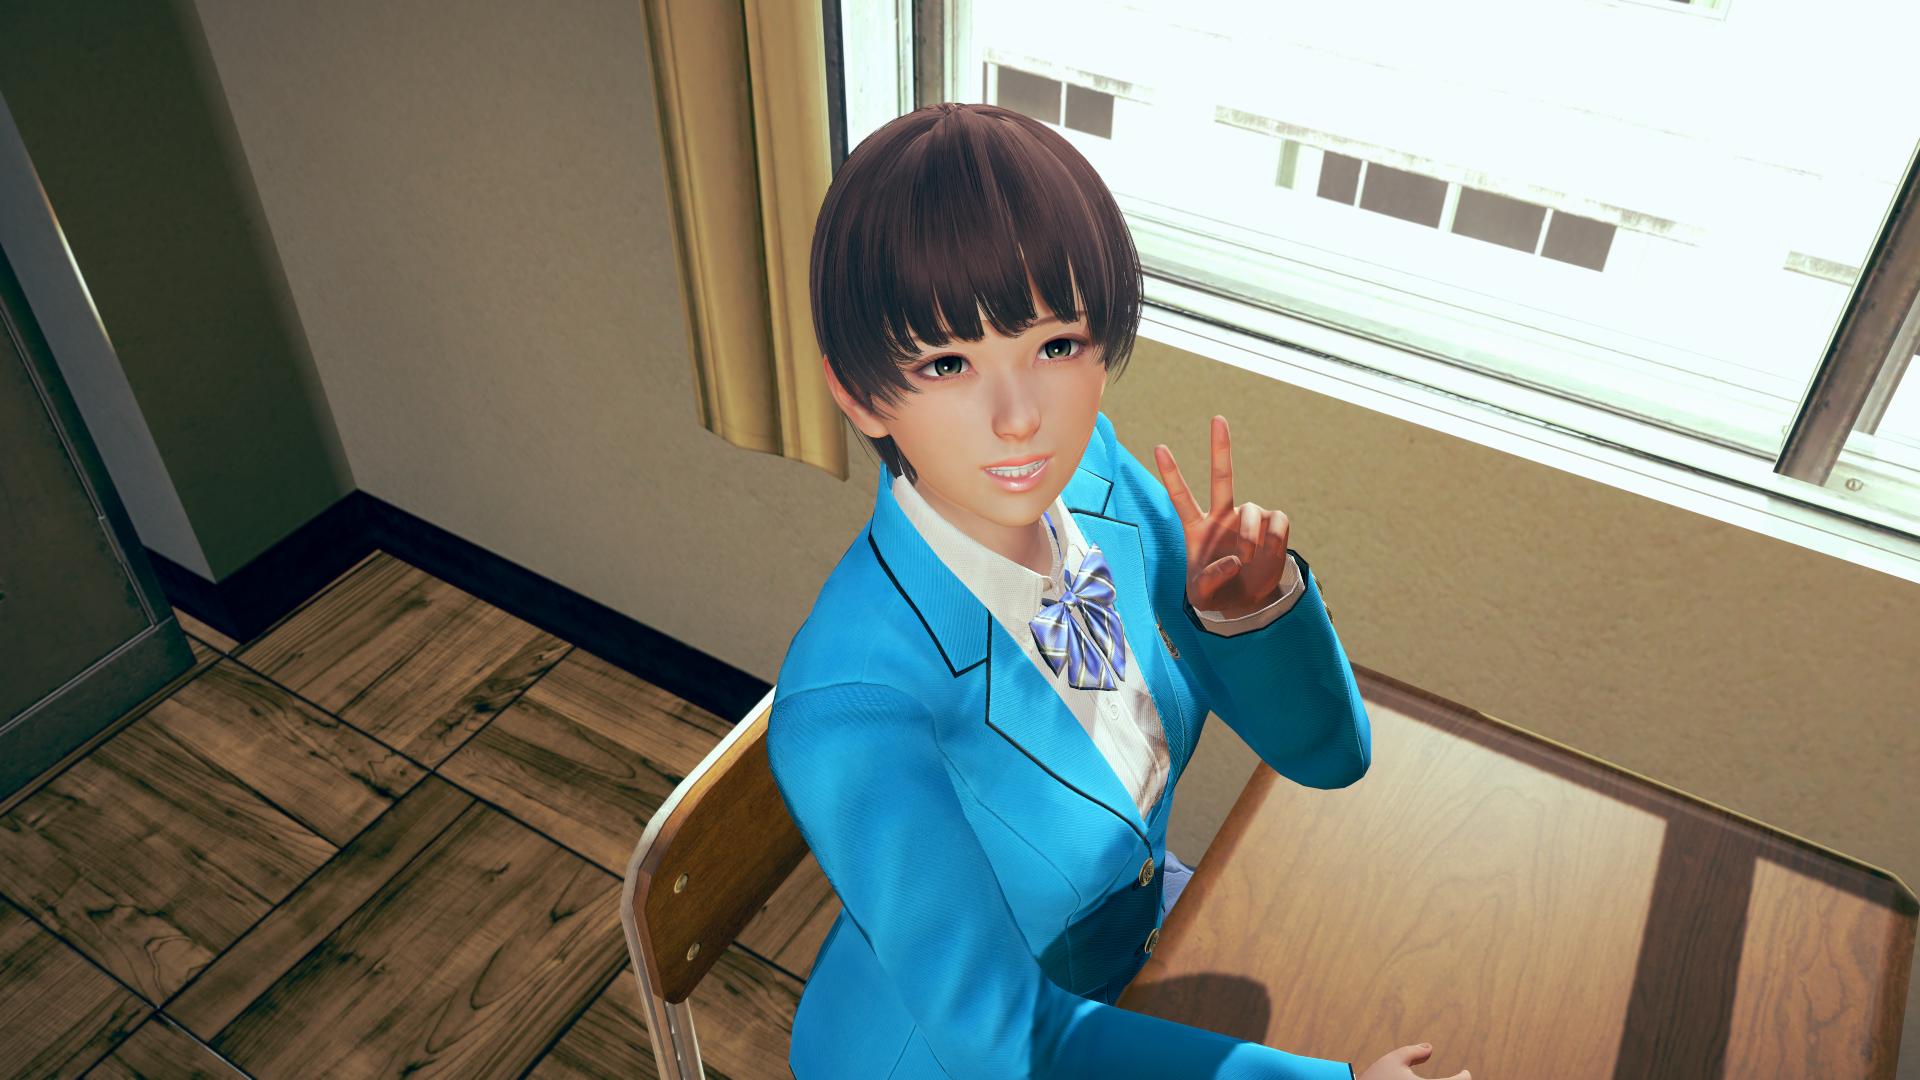 Download My Waifu Academia 0.01 PC Game for Mac